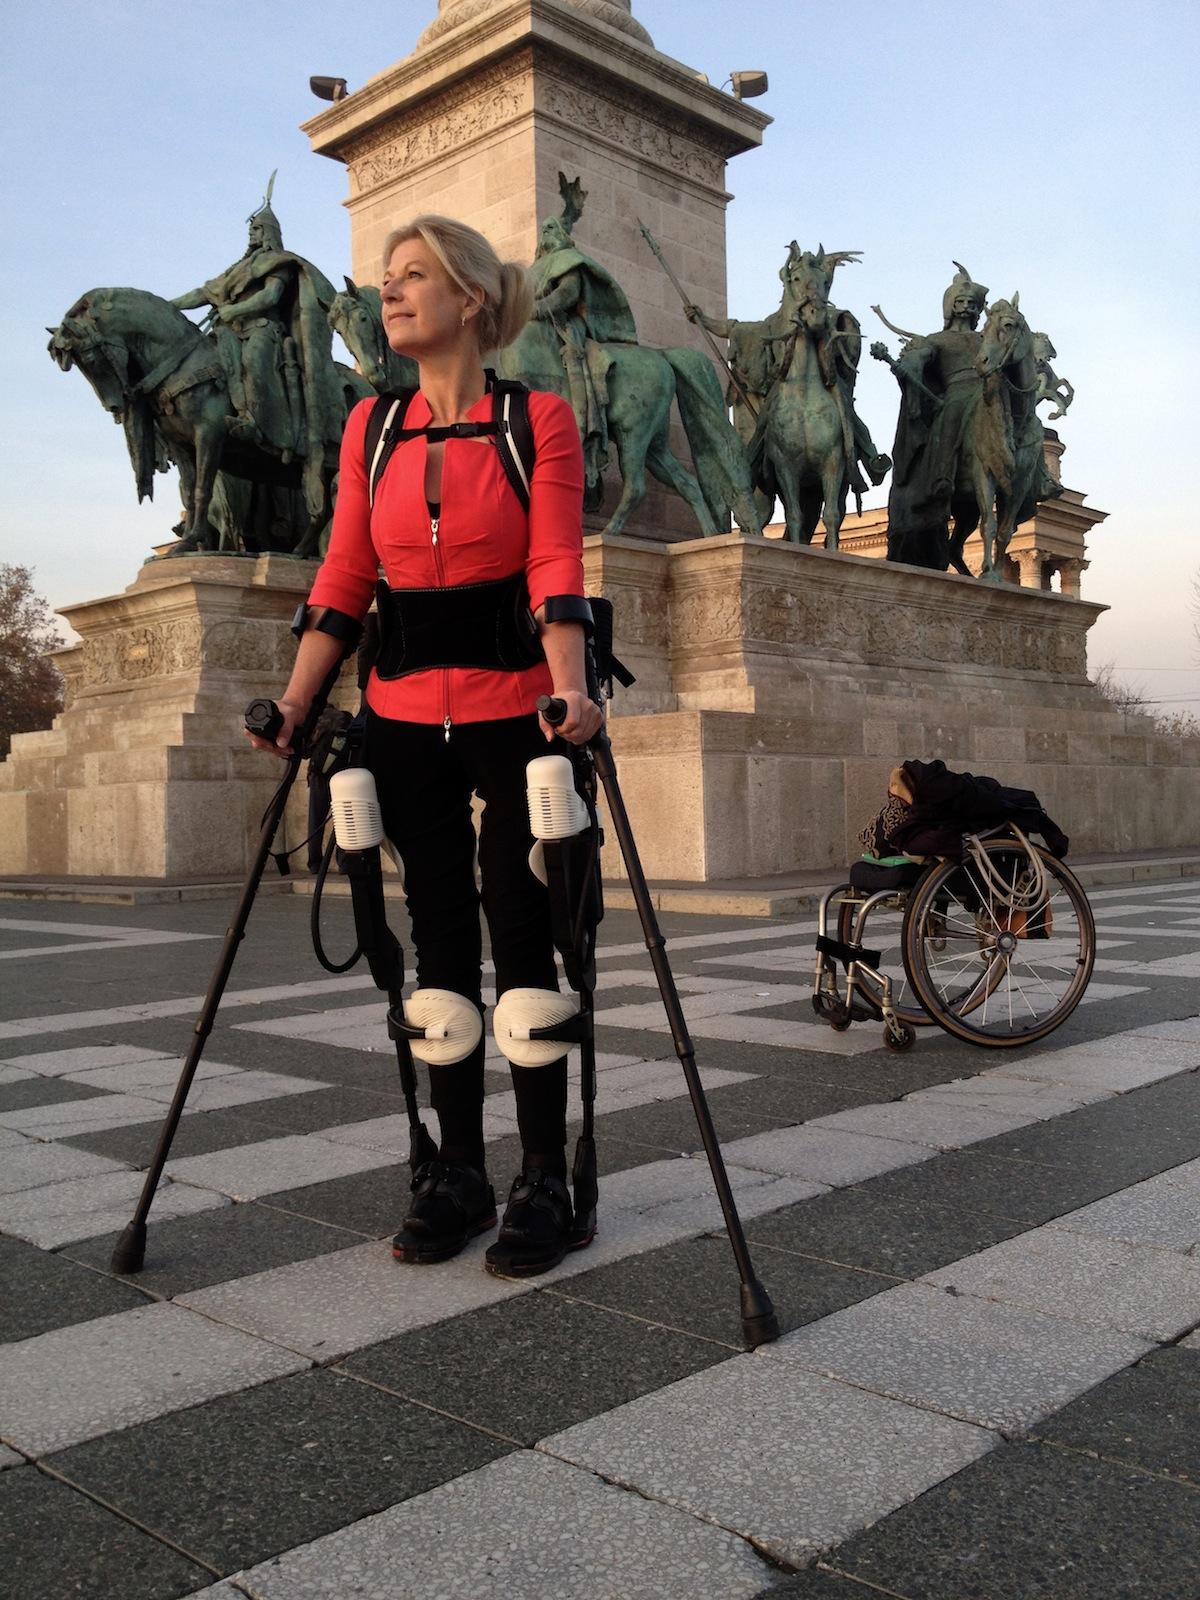 Amanda walking tall in Budapest.